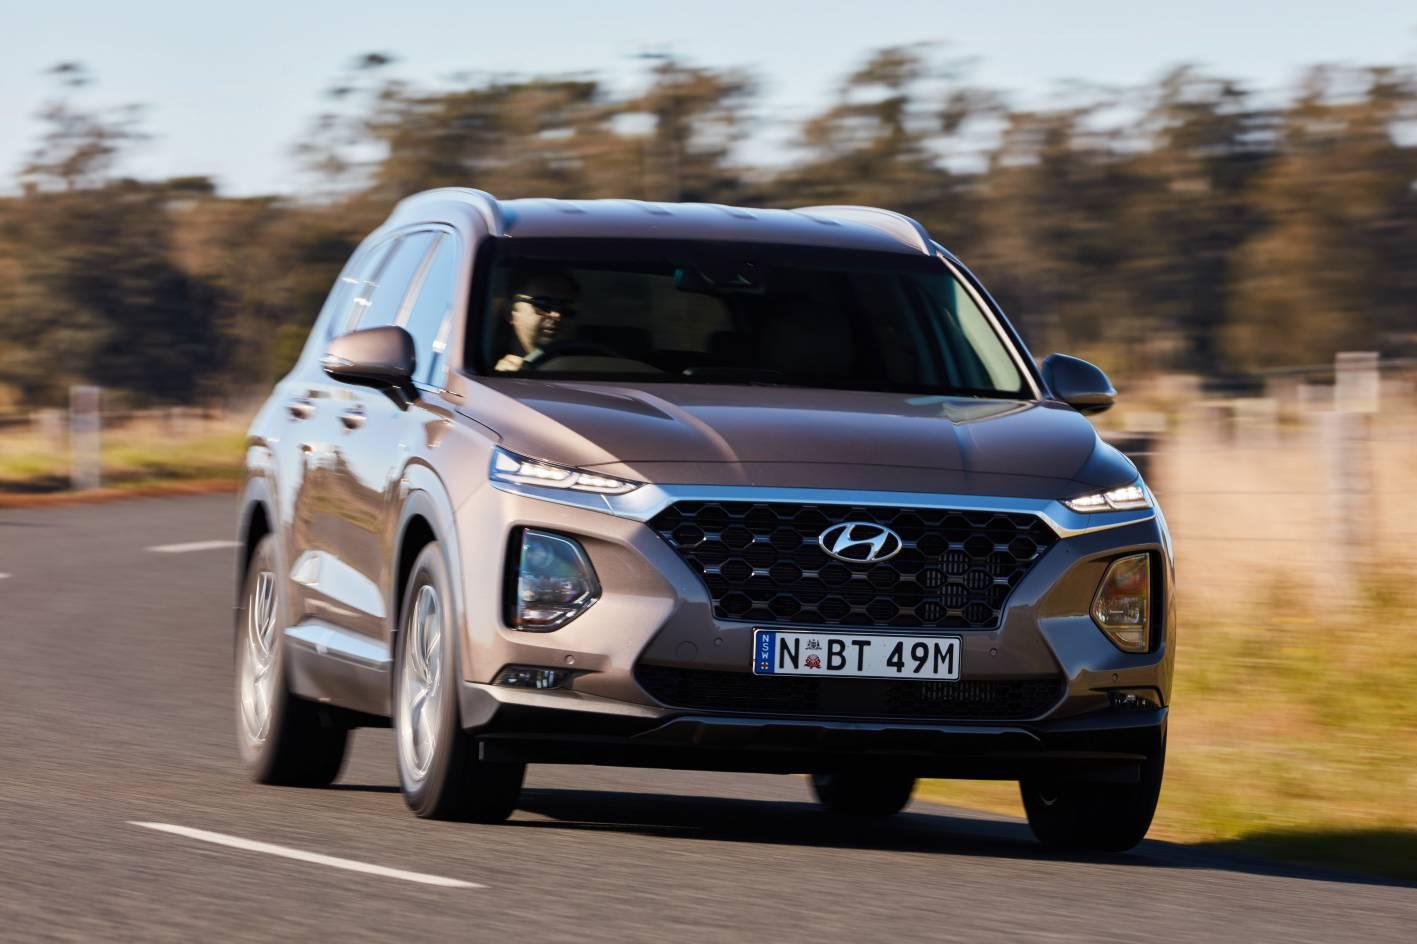 Hyundai's new Santa Fe SUV - 2